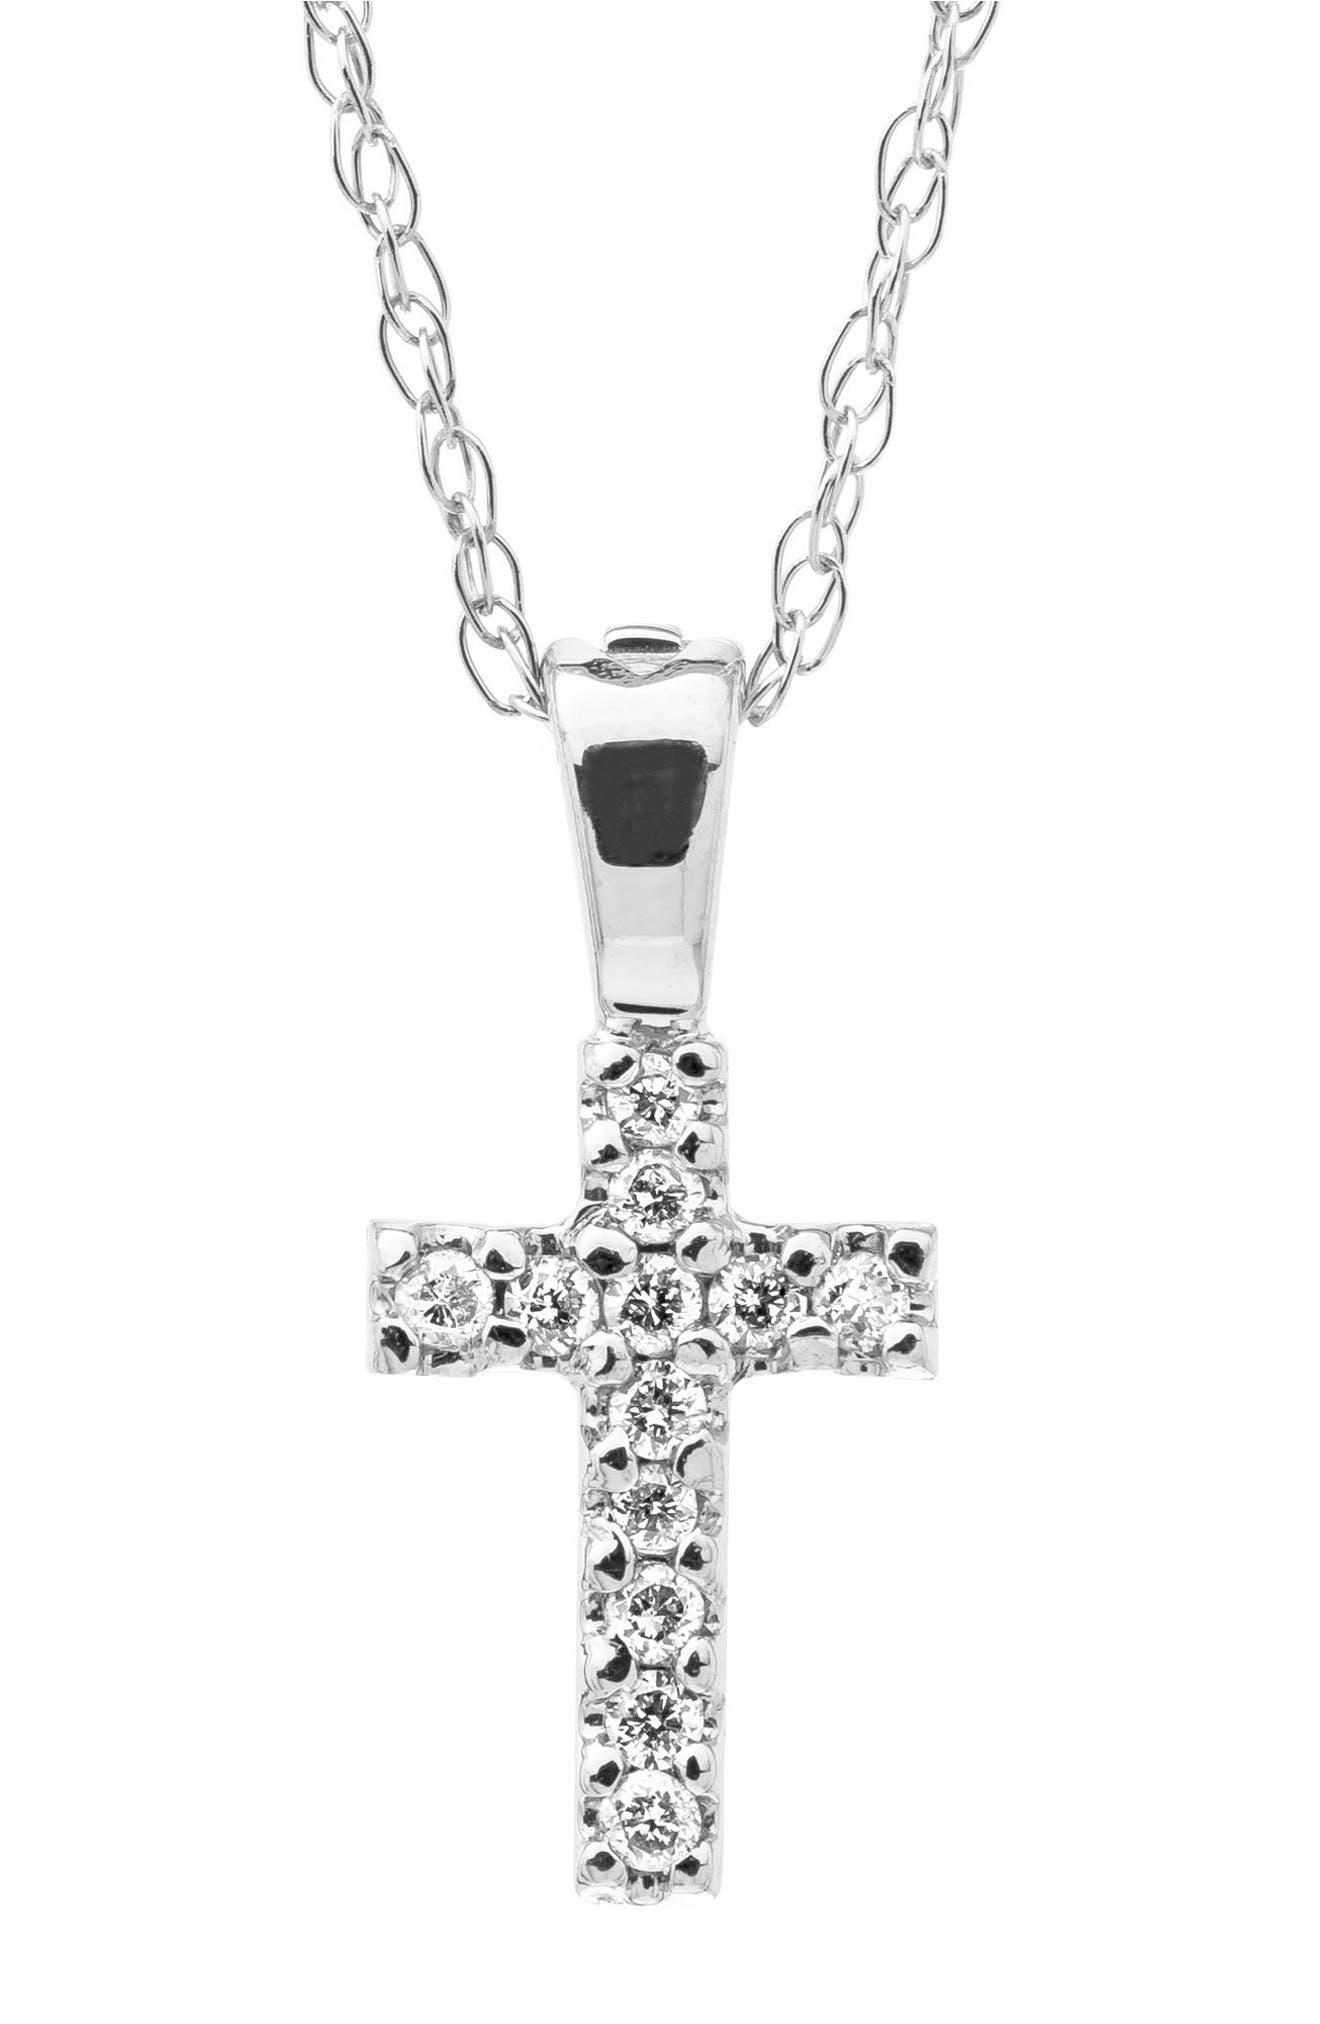 14k White Gold & Diamond Cross Necklace,                             Main thumbnail 1, color,                             WHITE